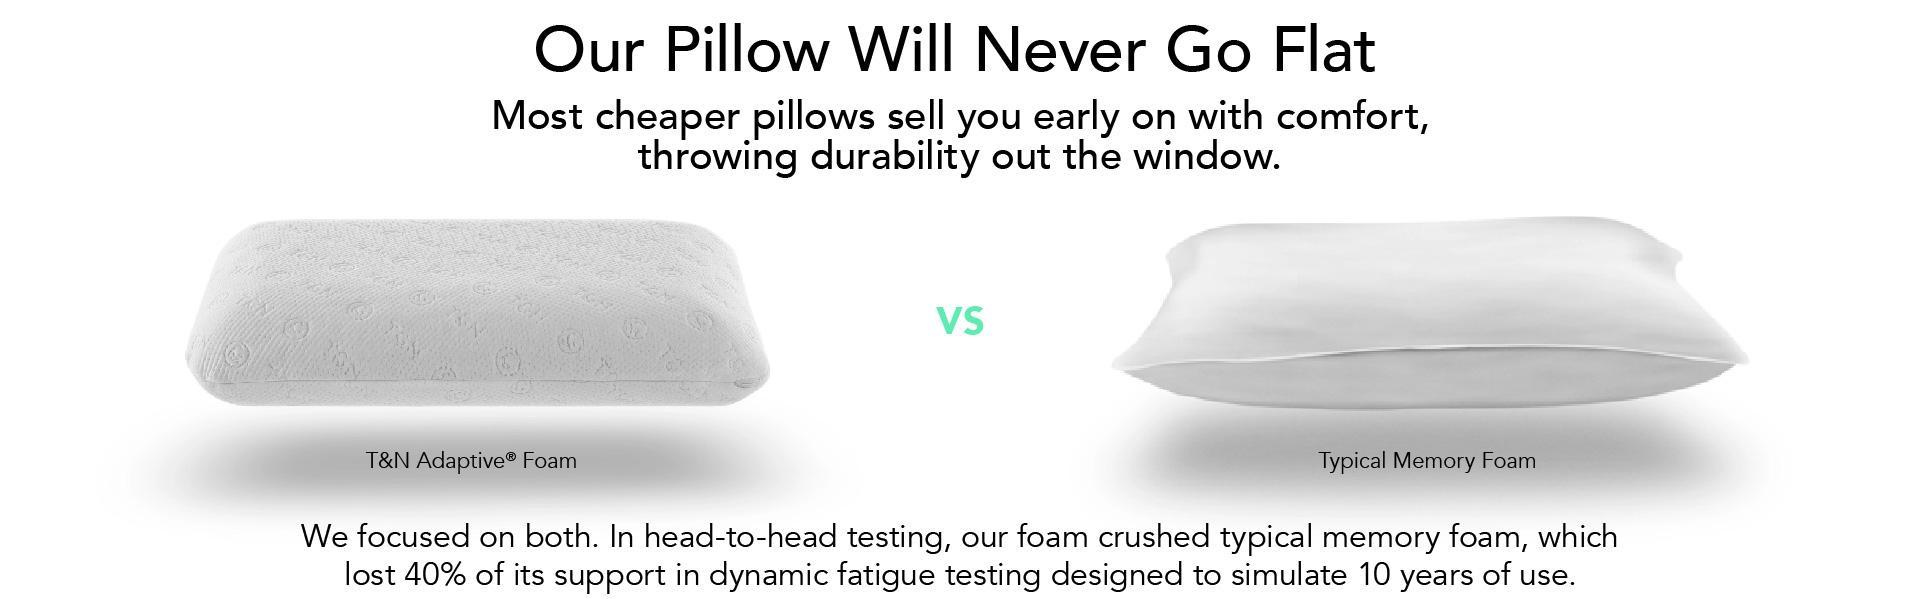 Amazon Com Tuft Amp Needle Premium Pillow King Size With T